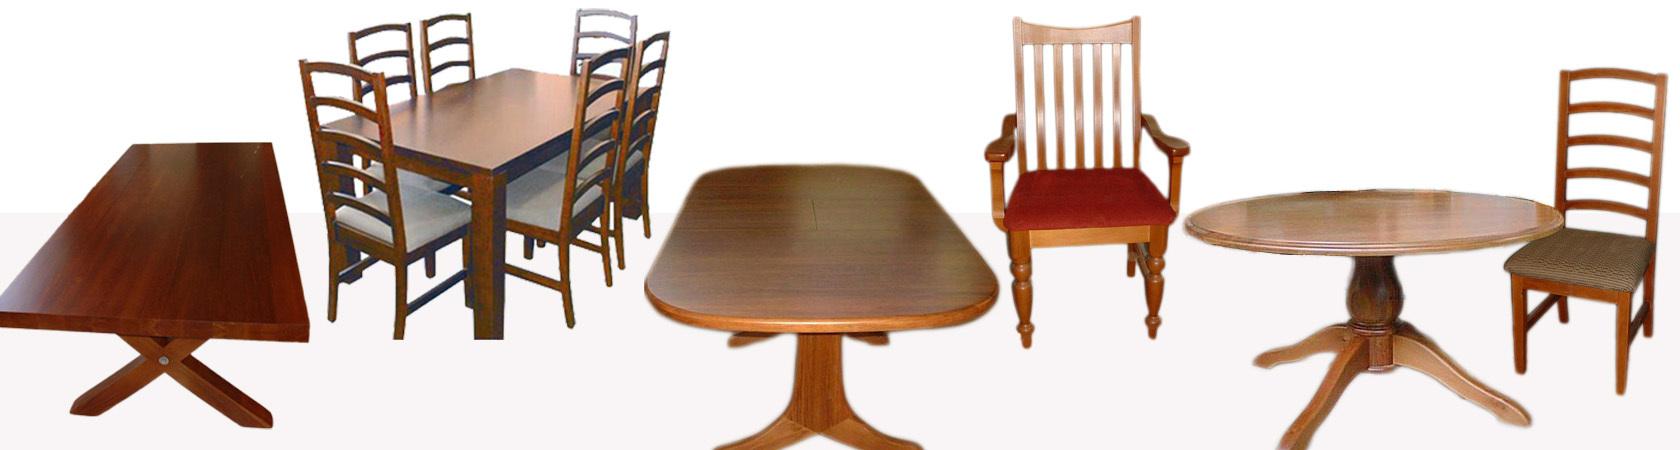 Bespoke Furniture Christchurch Made to Order Furniture